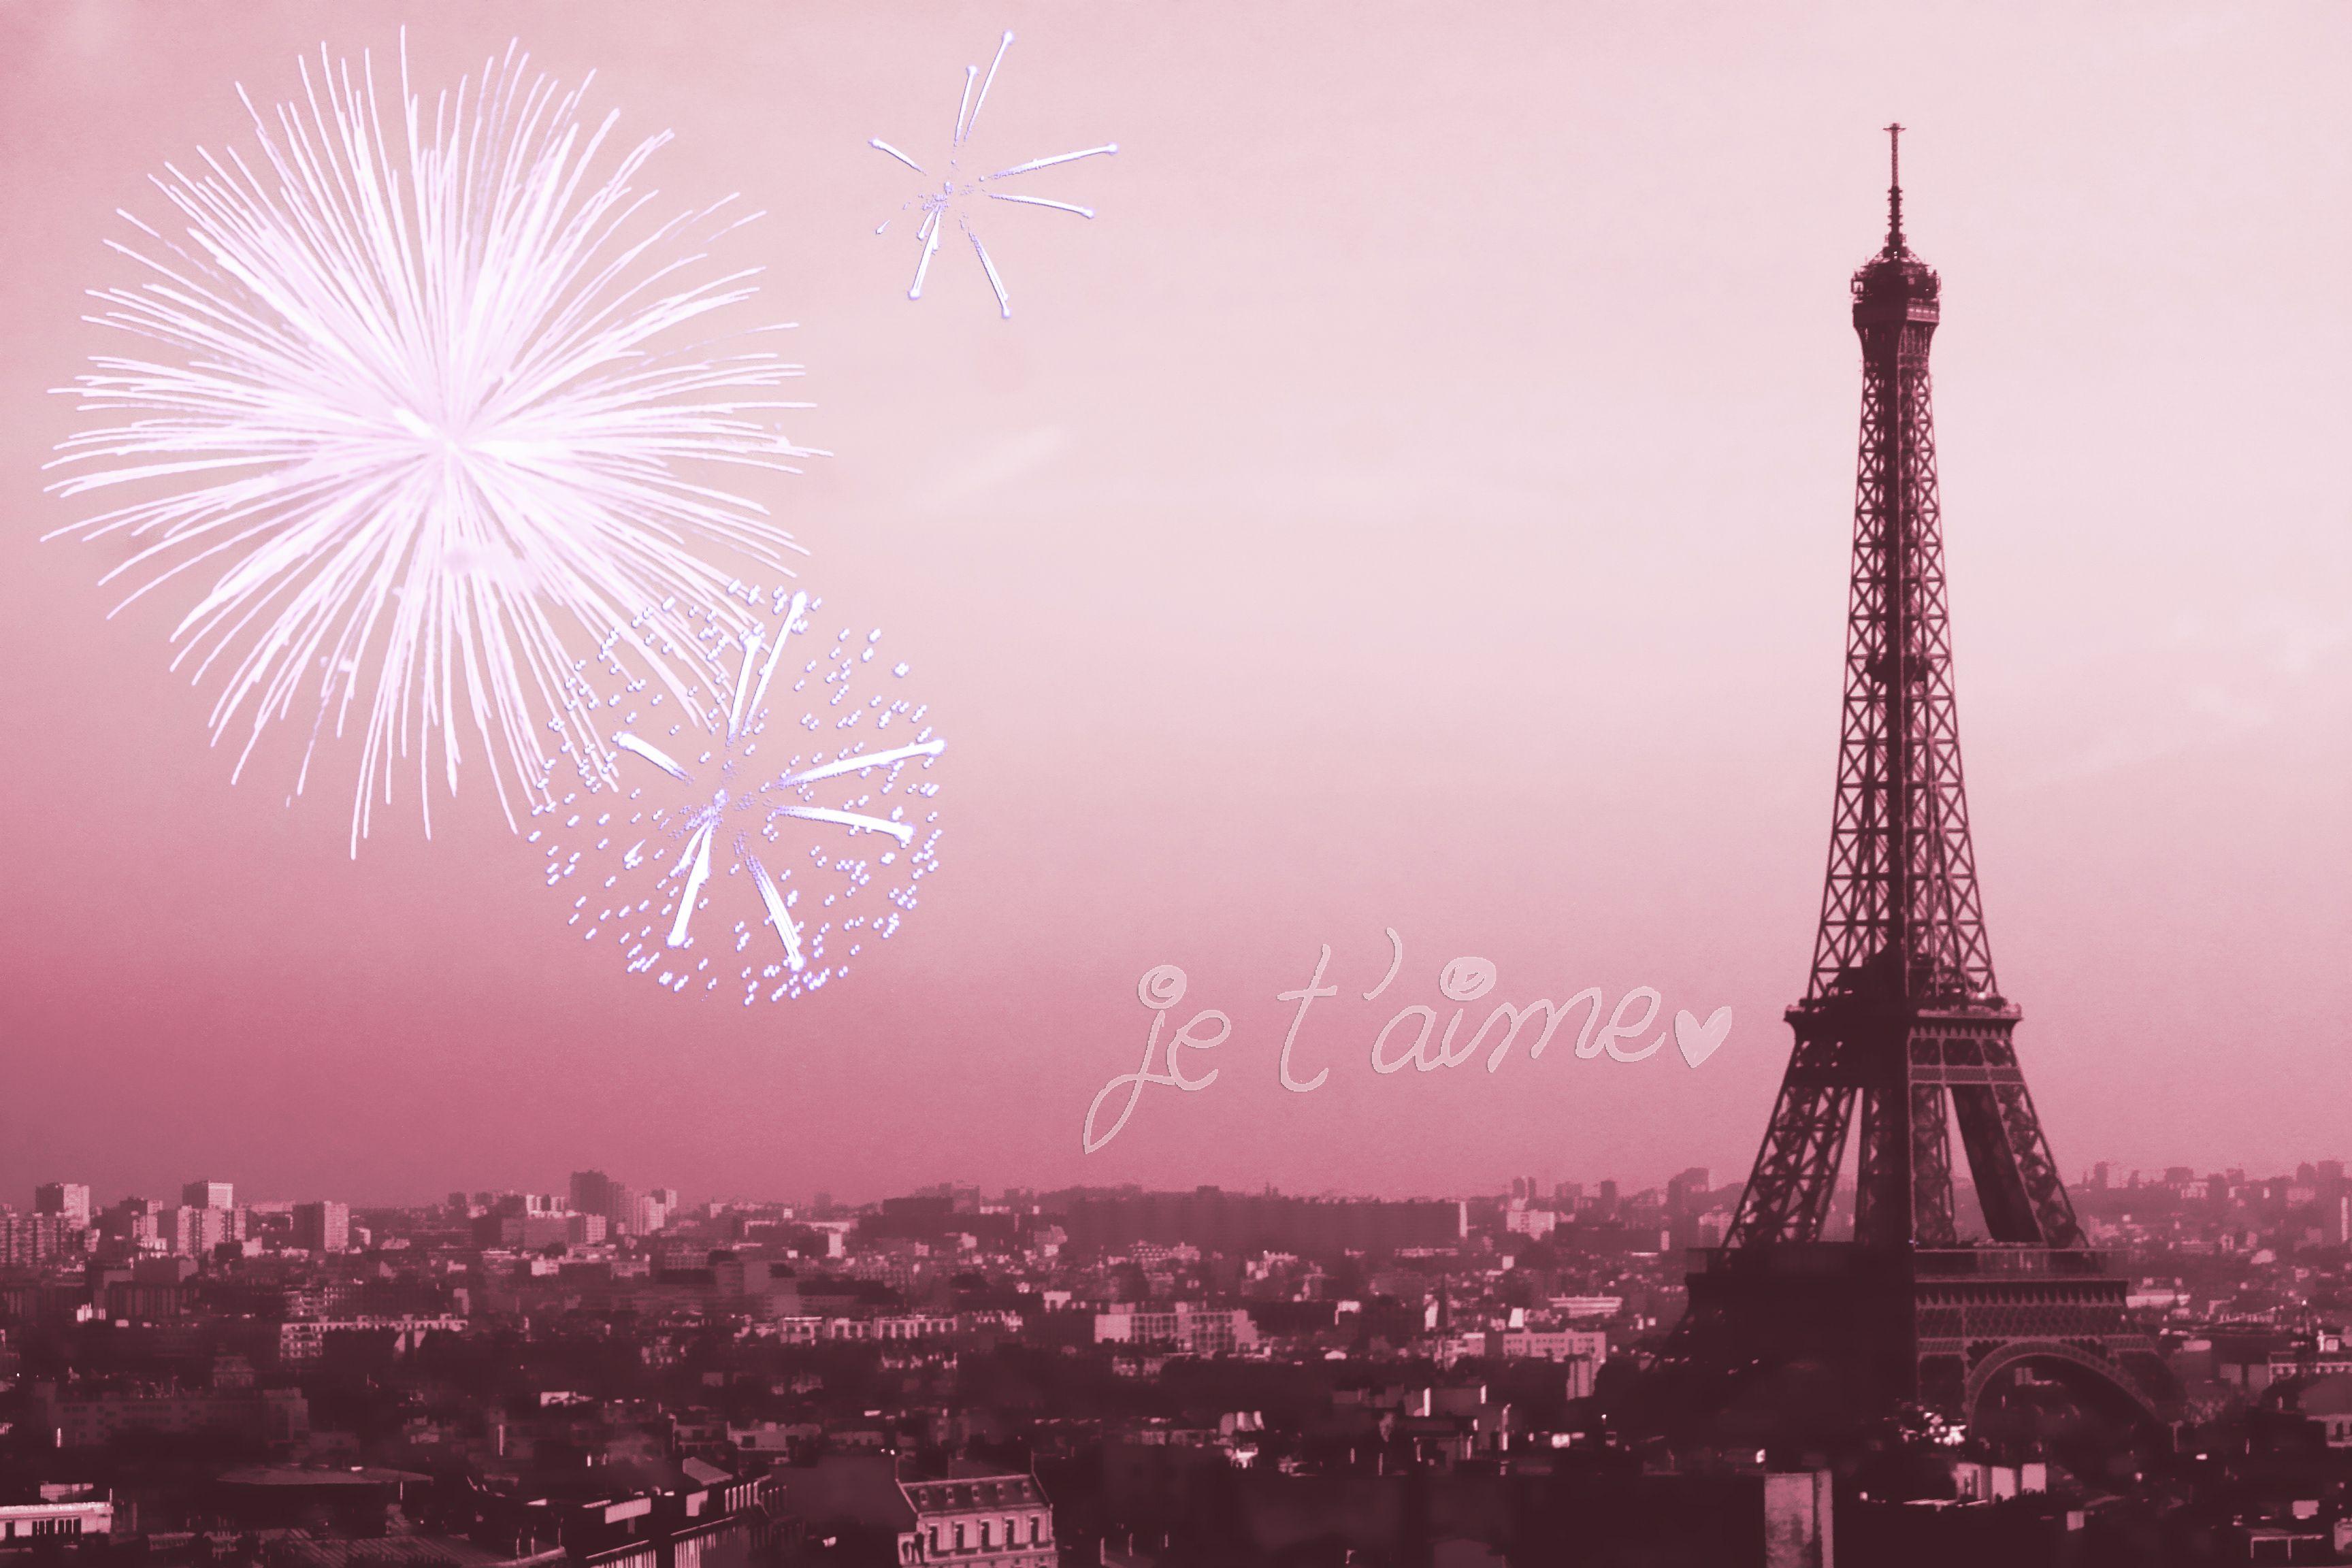 Paris Wallpaper Fireworks Eiffel Tower